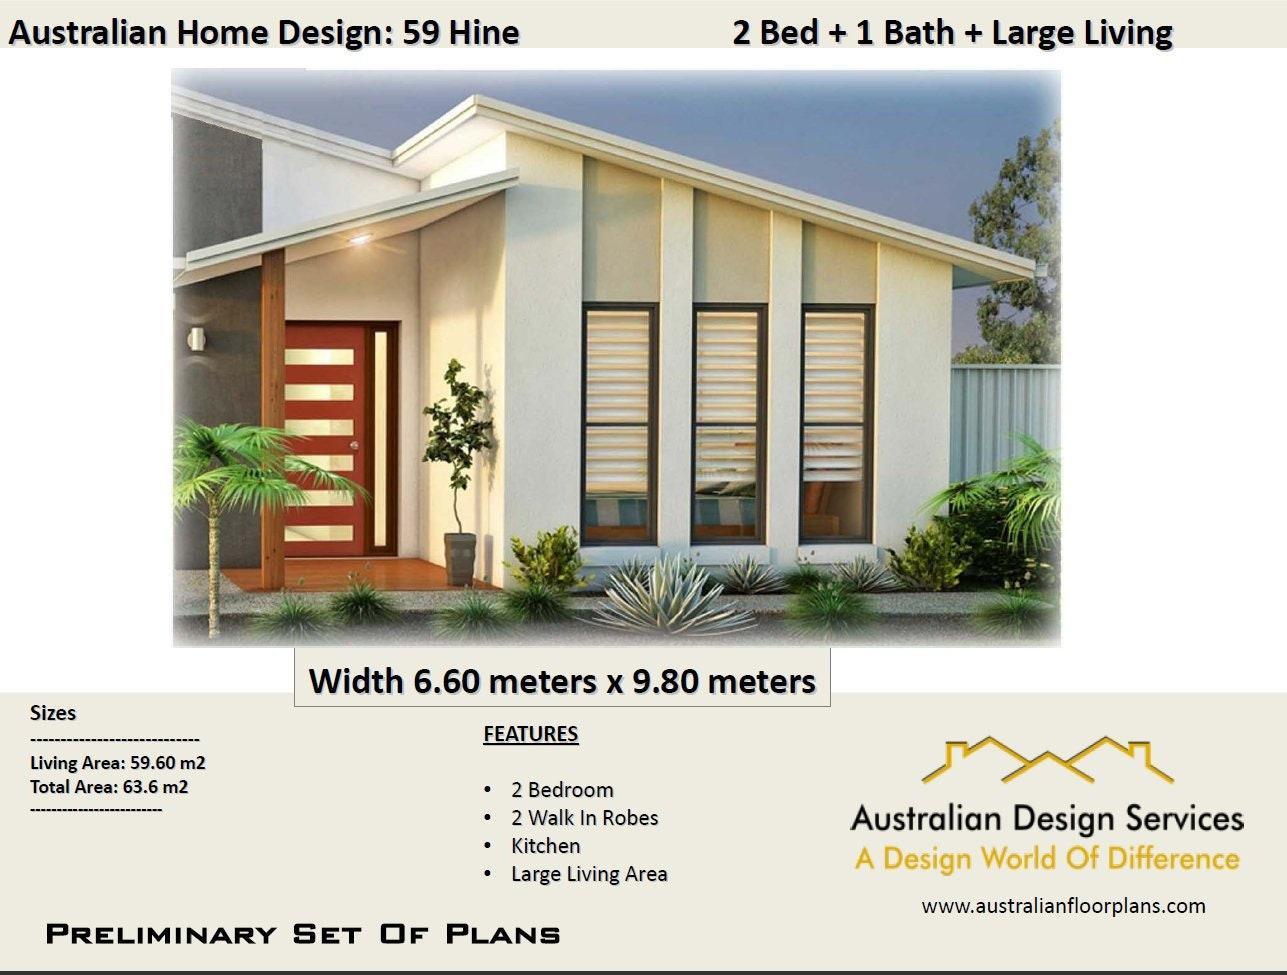 Australian Granny Flat Design Hine 59 m2   678 sq foot   2 Bedroom on contact design, build design, study design, chat design, tear design, drink design,